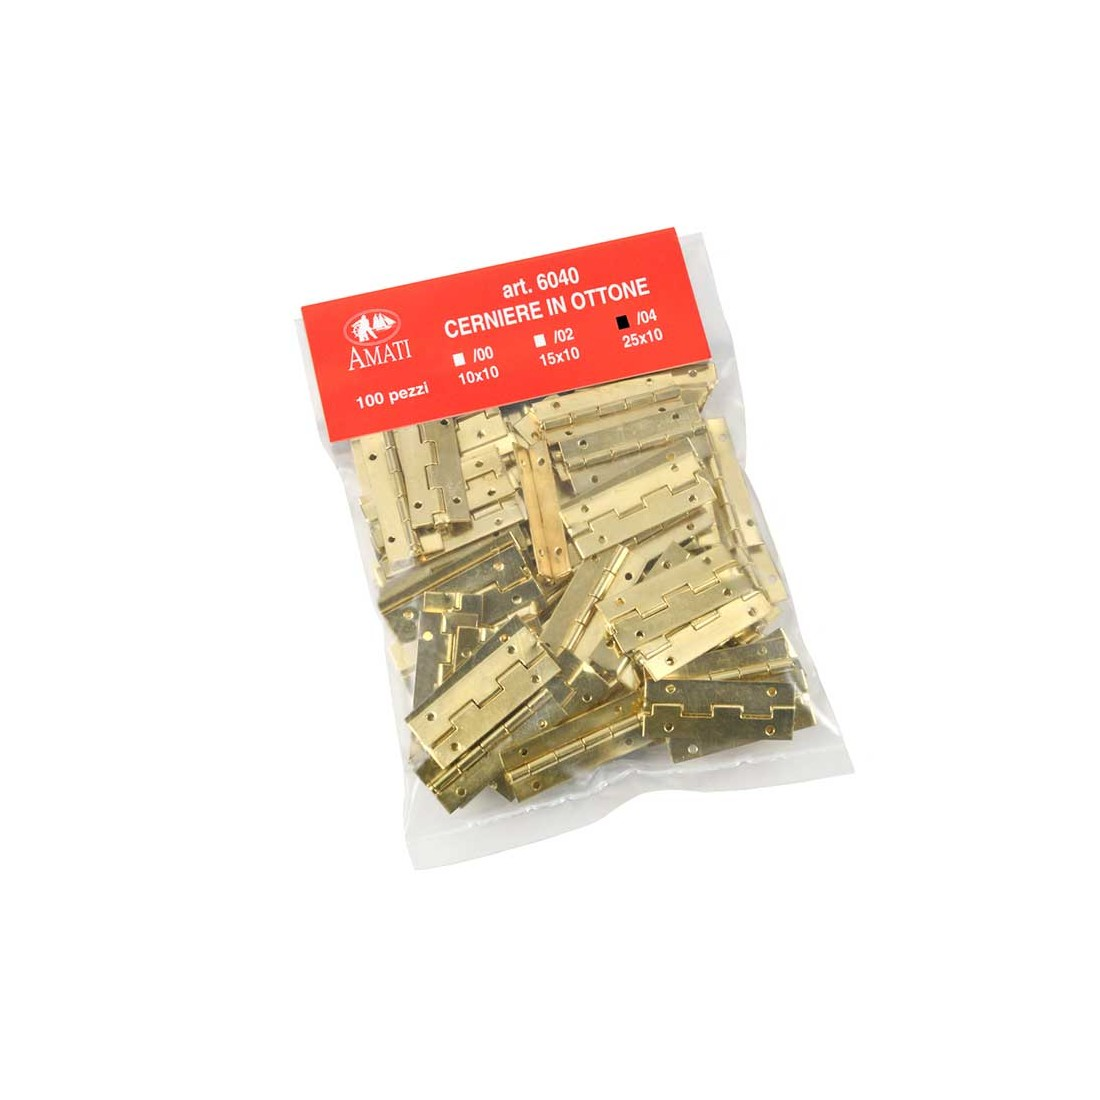 Cerniere ottone n.4 mm. 25x10